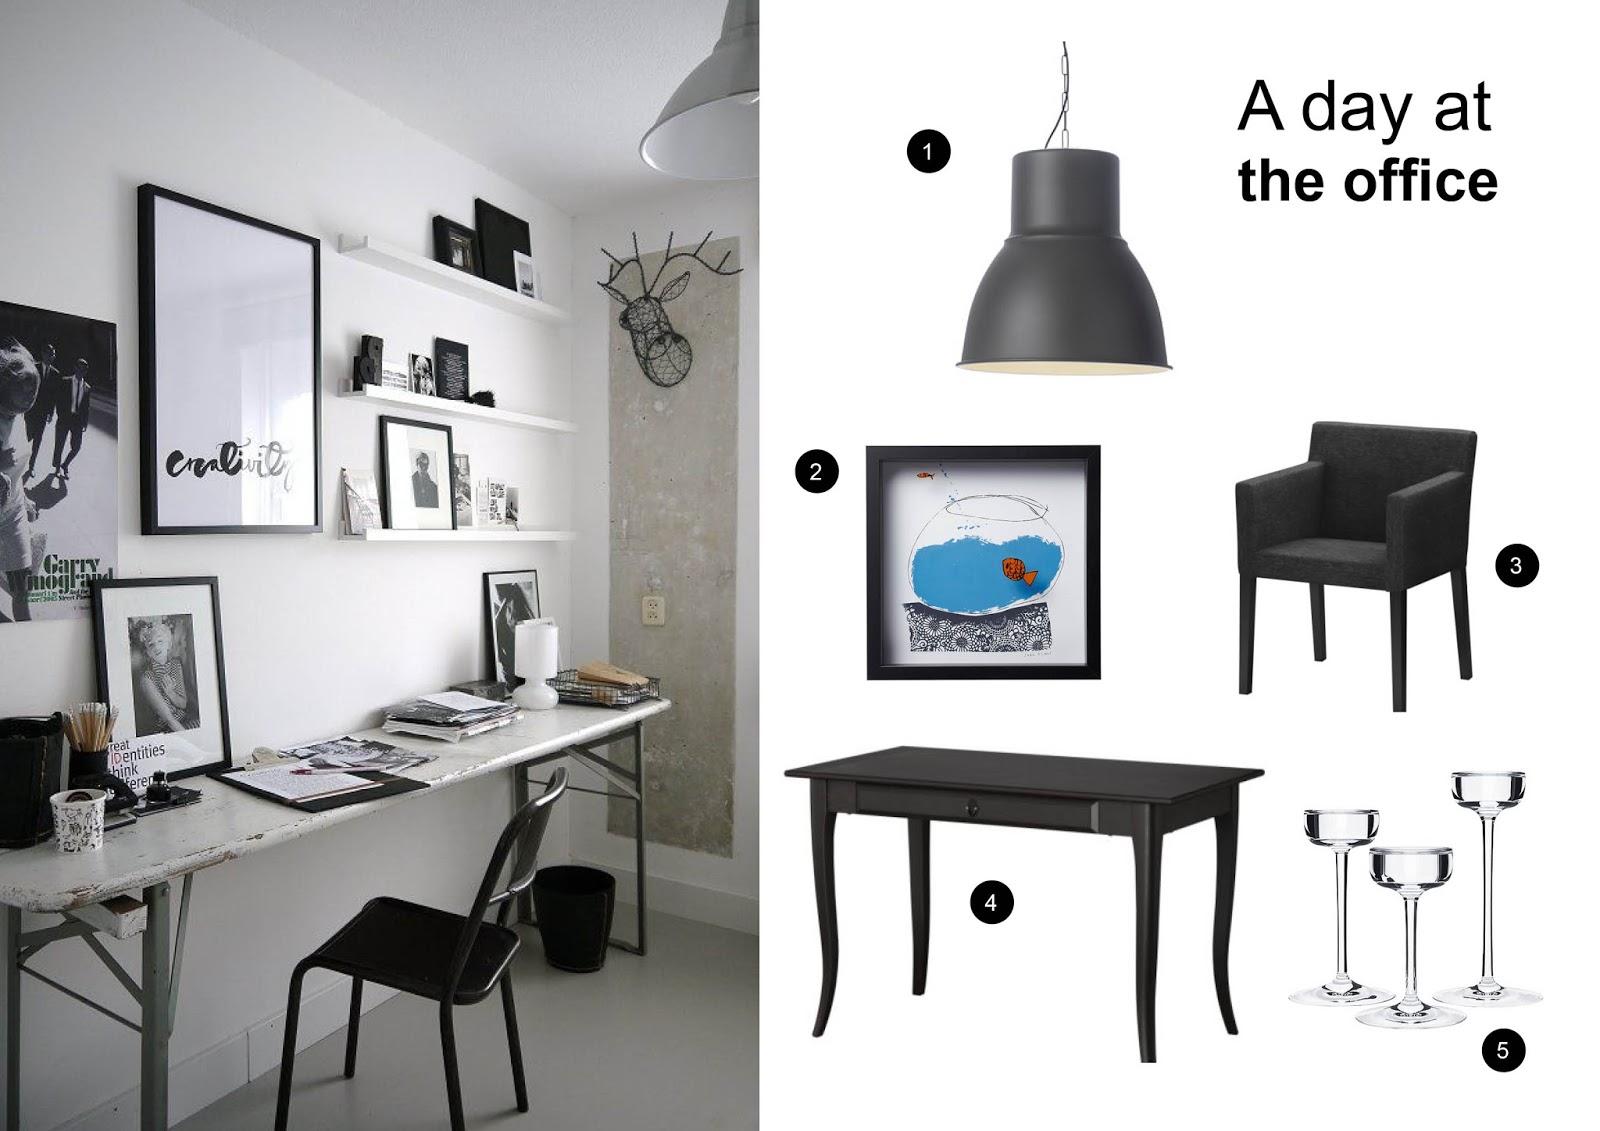 Annemieknieboer.com : all ikea: cool office